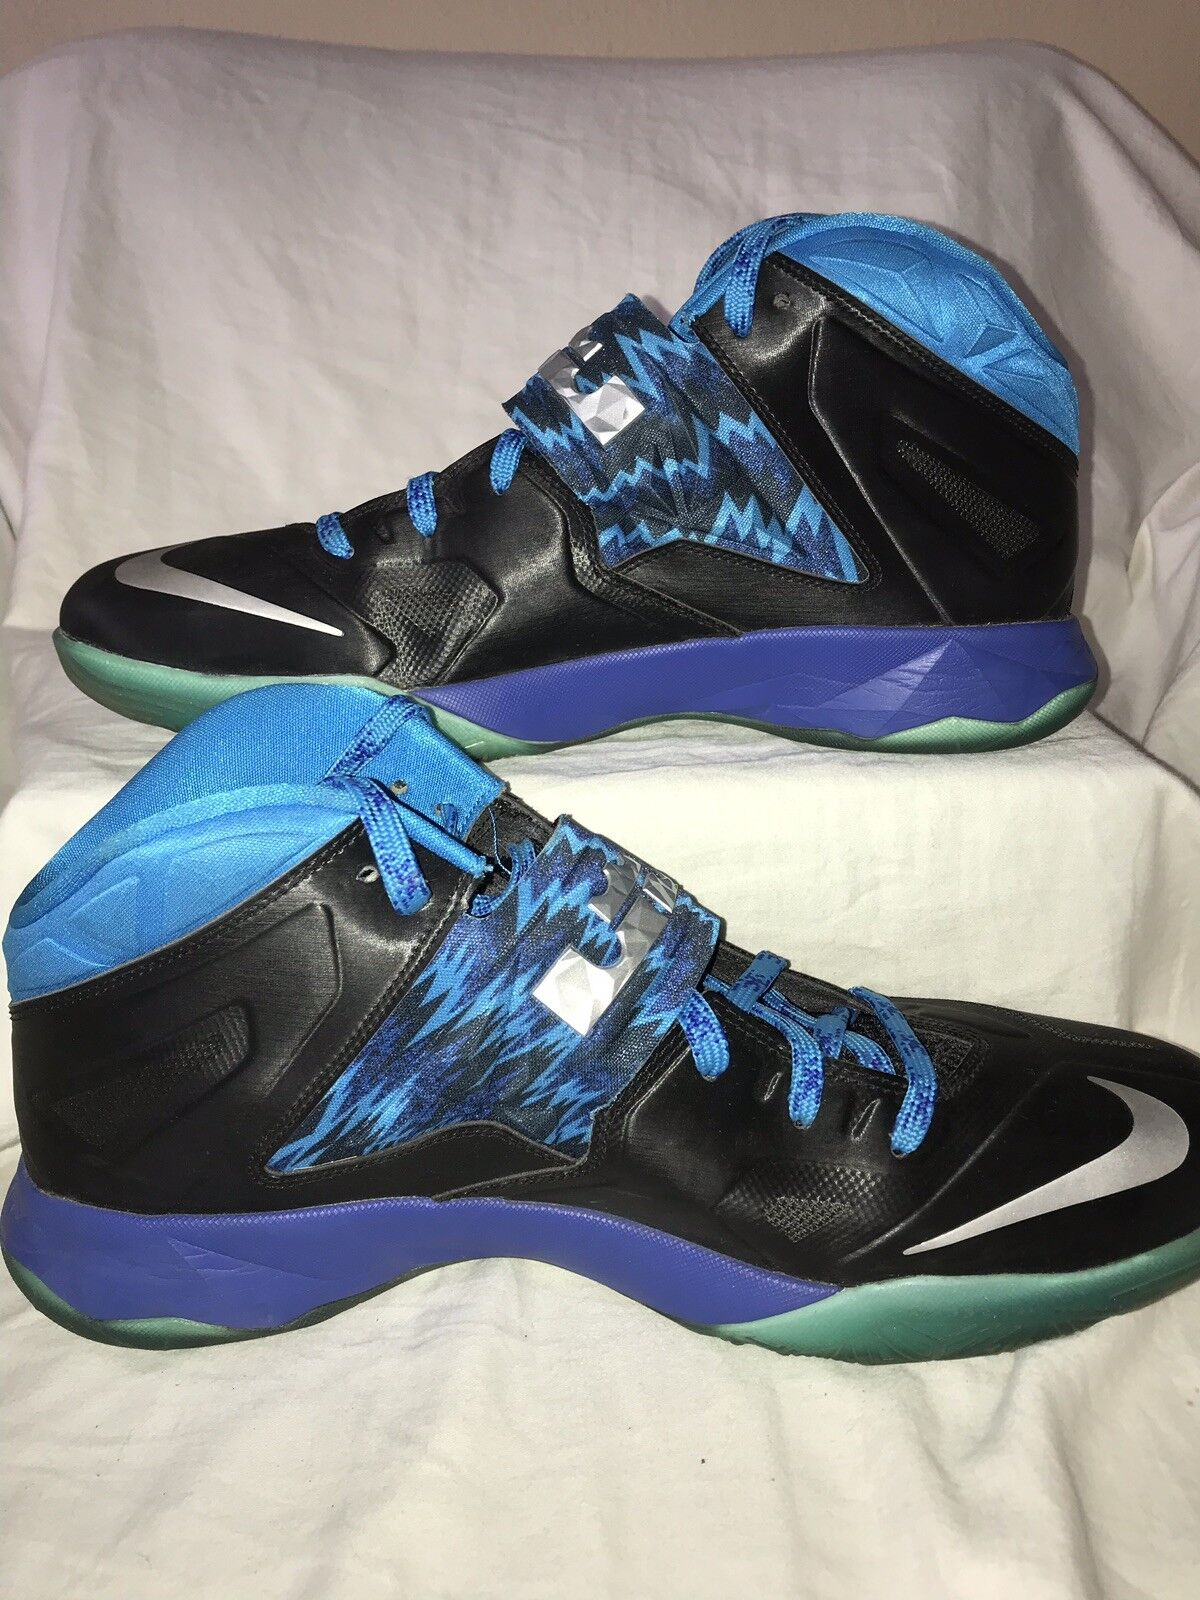 Nike Lebron James Zoom Soldier VII Size 14